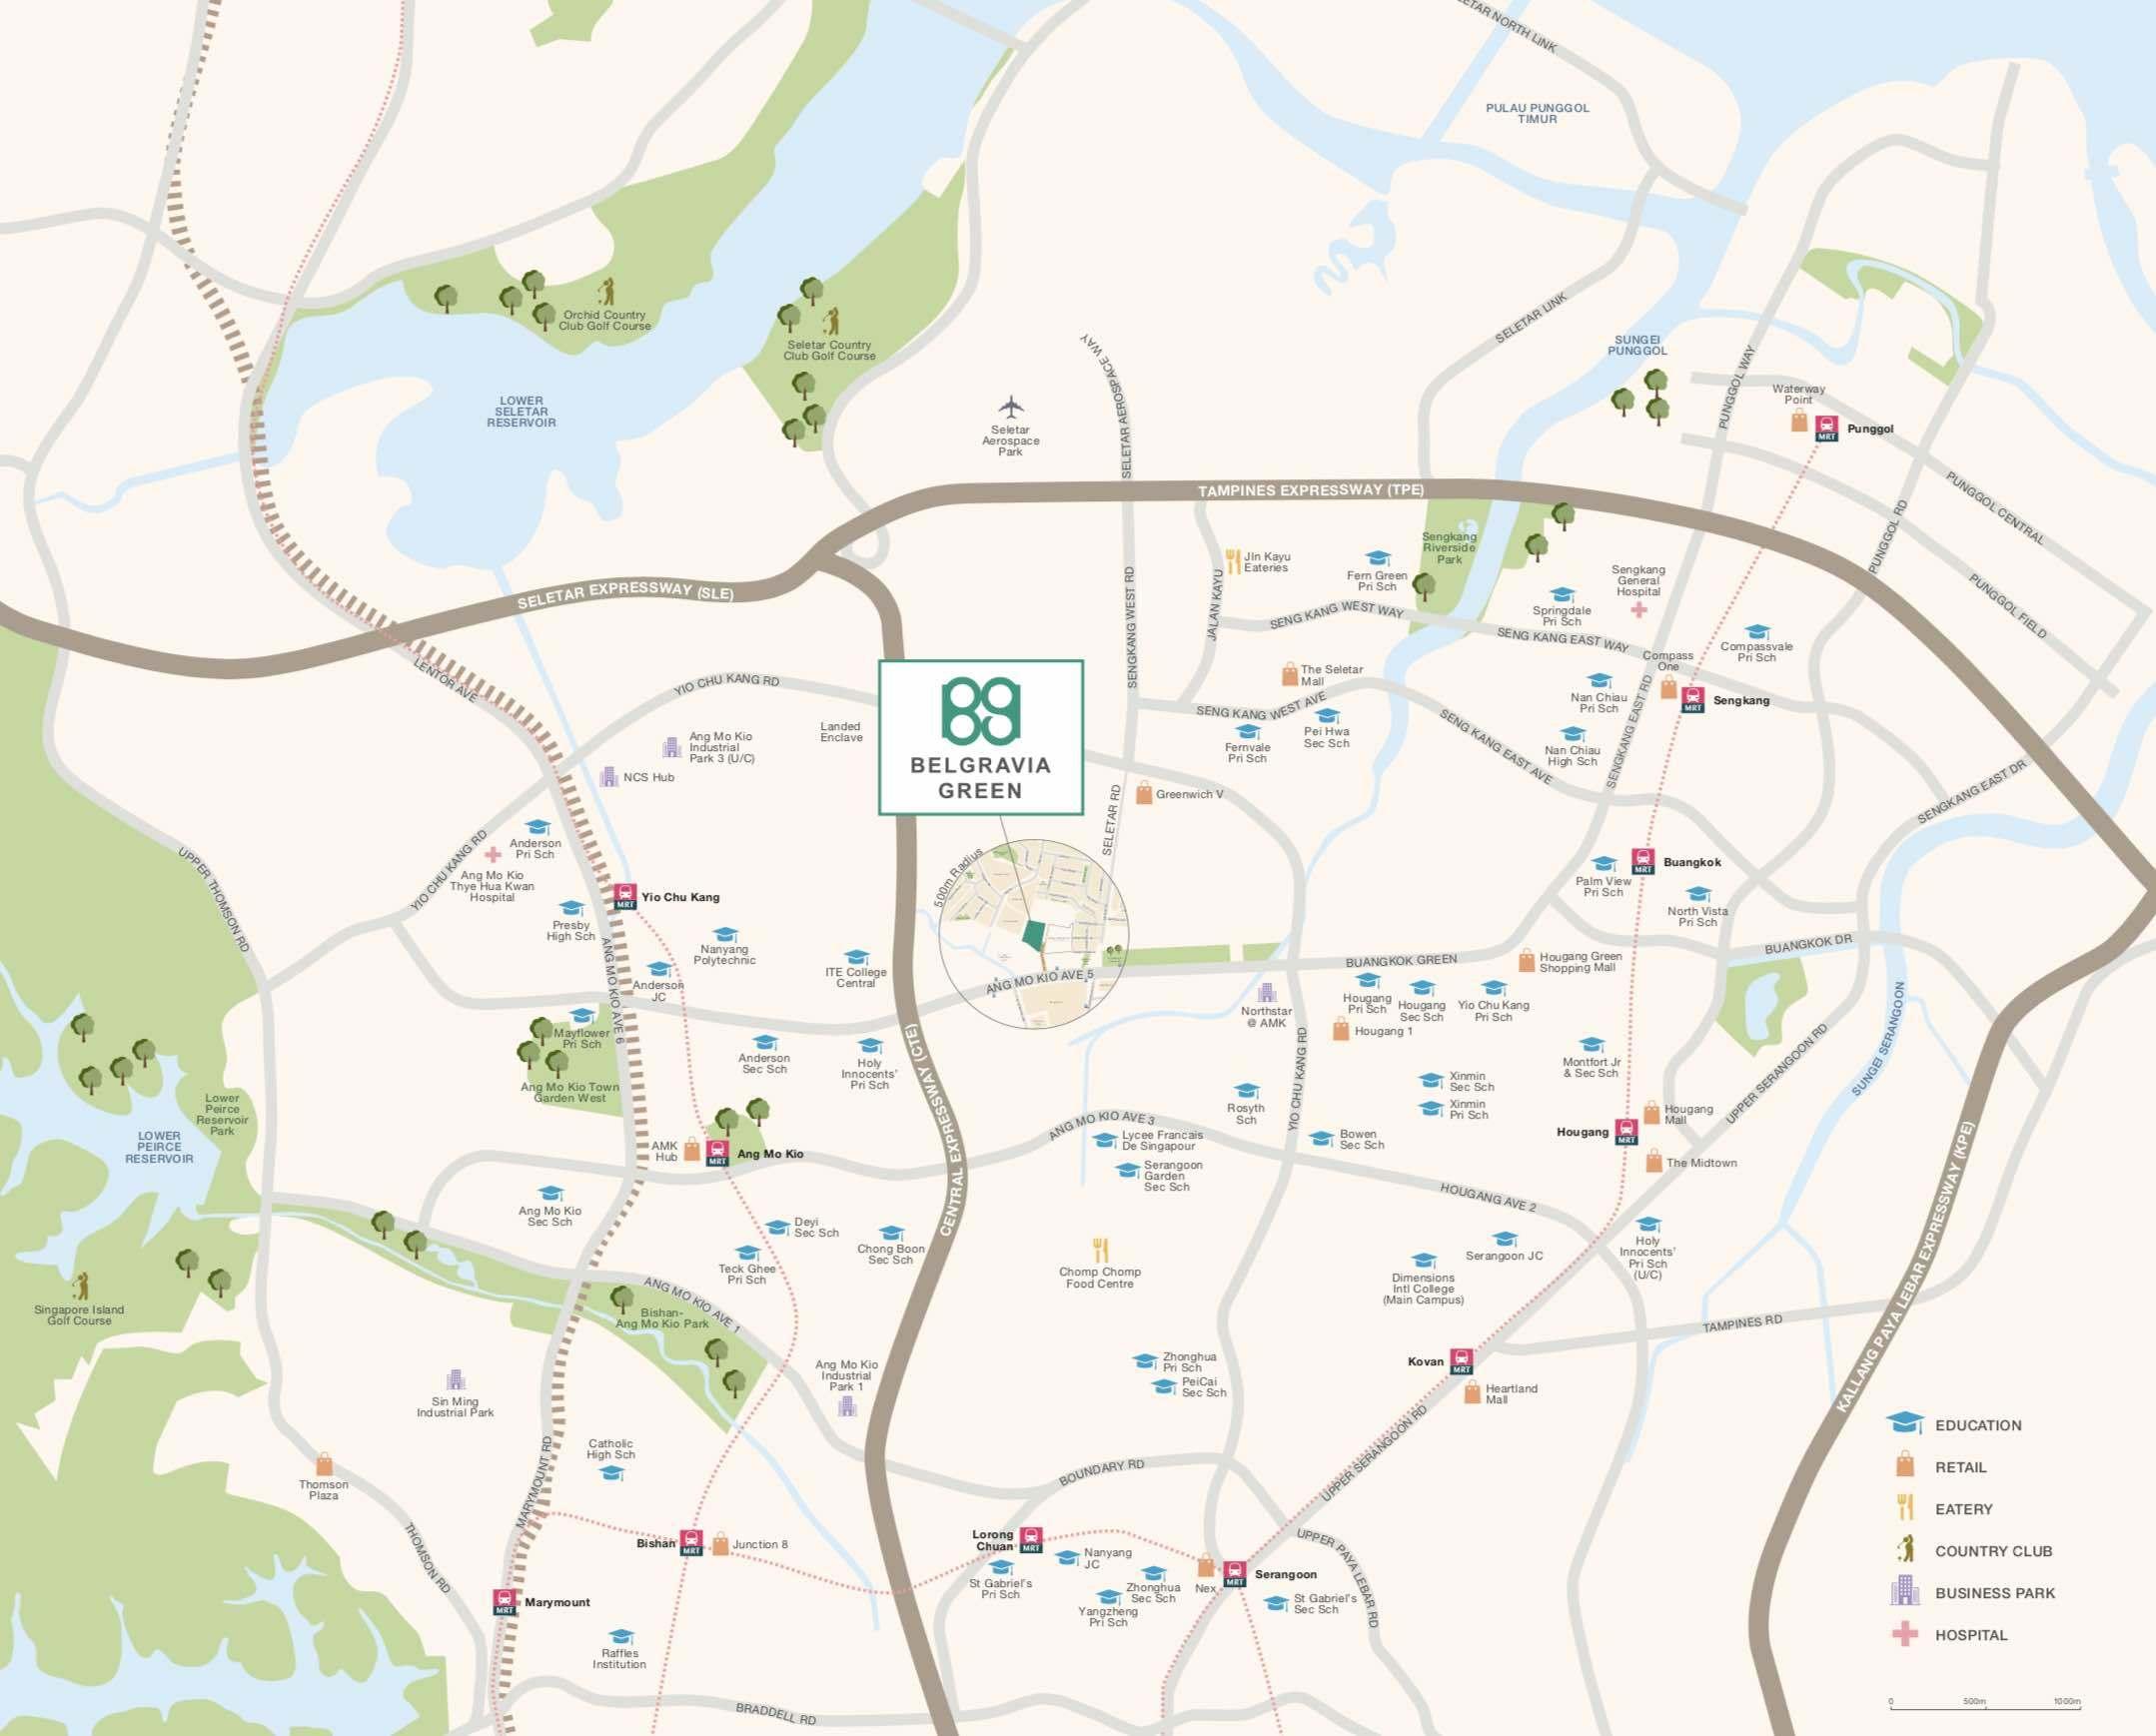 Begravia-green-location-map